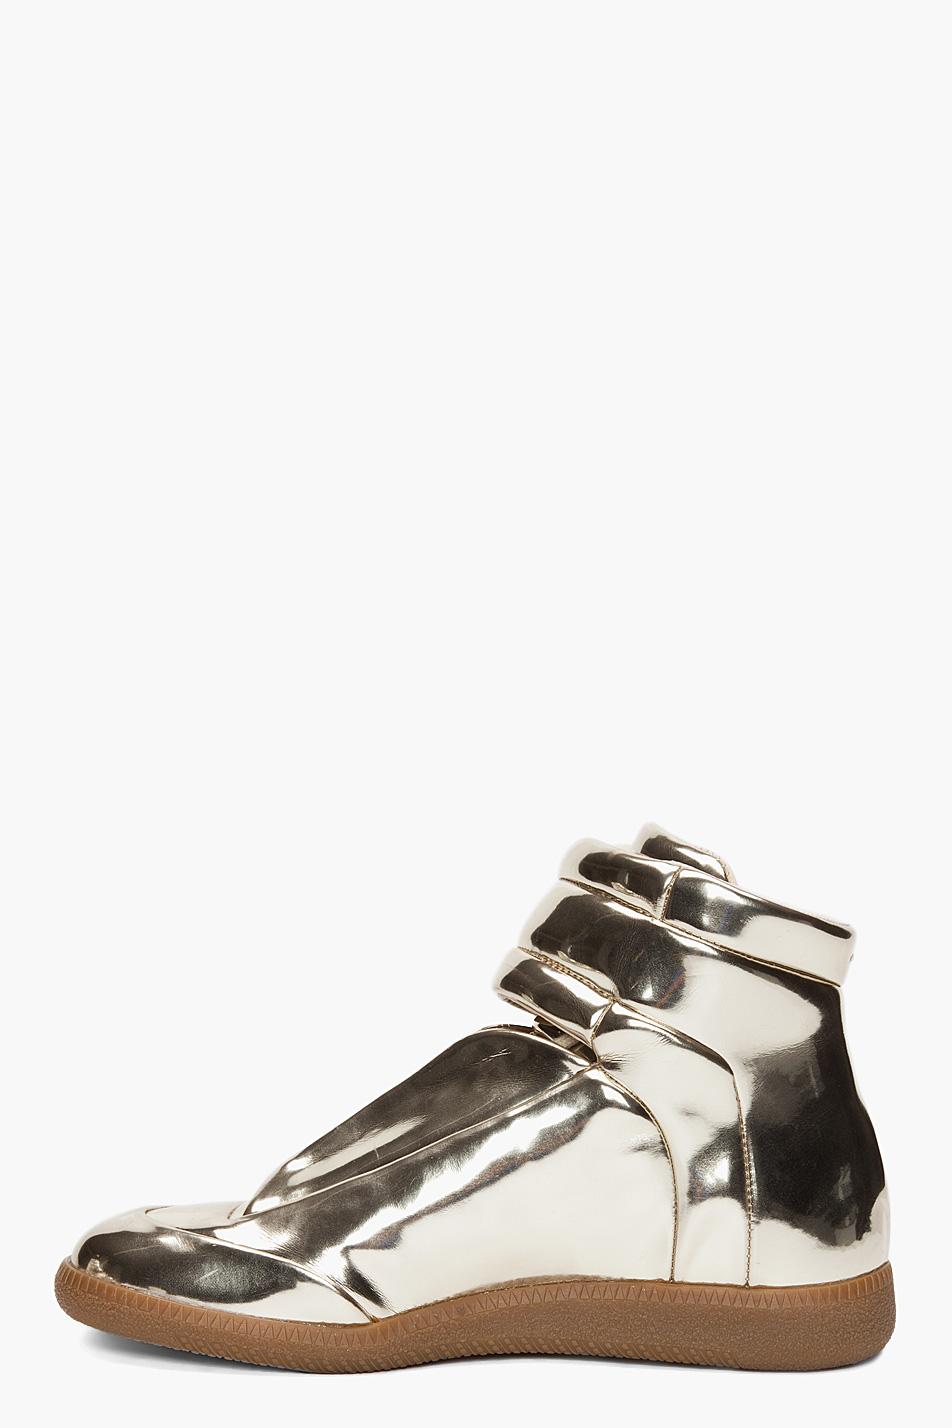 maison martin margiela metallic sneakers. Black Bedroom Furniture Sets. Home Design Ideas